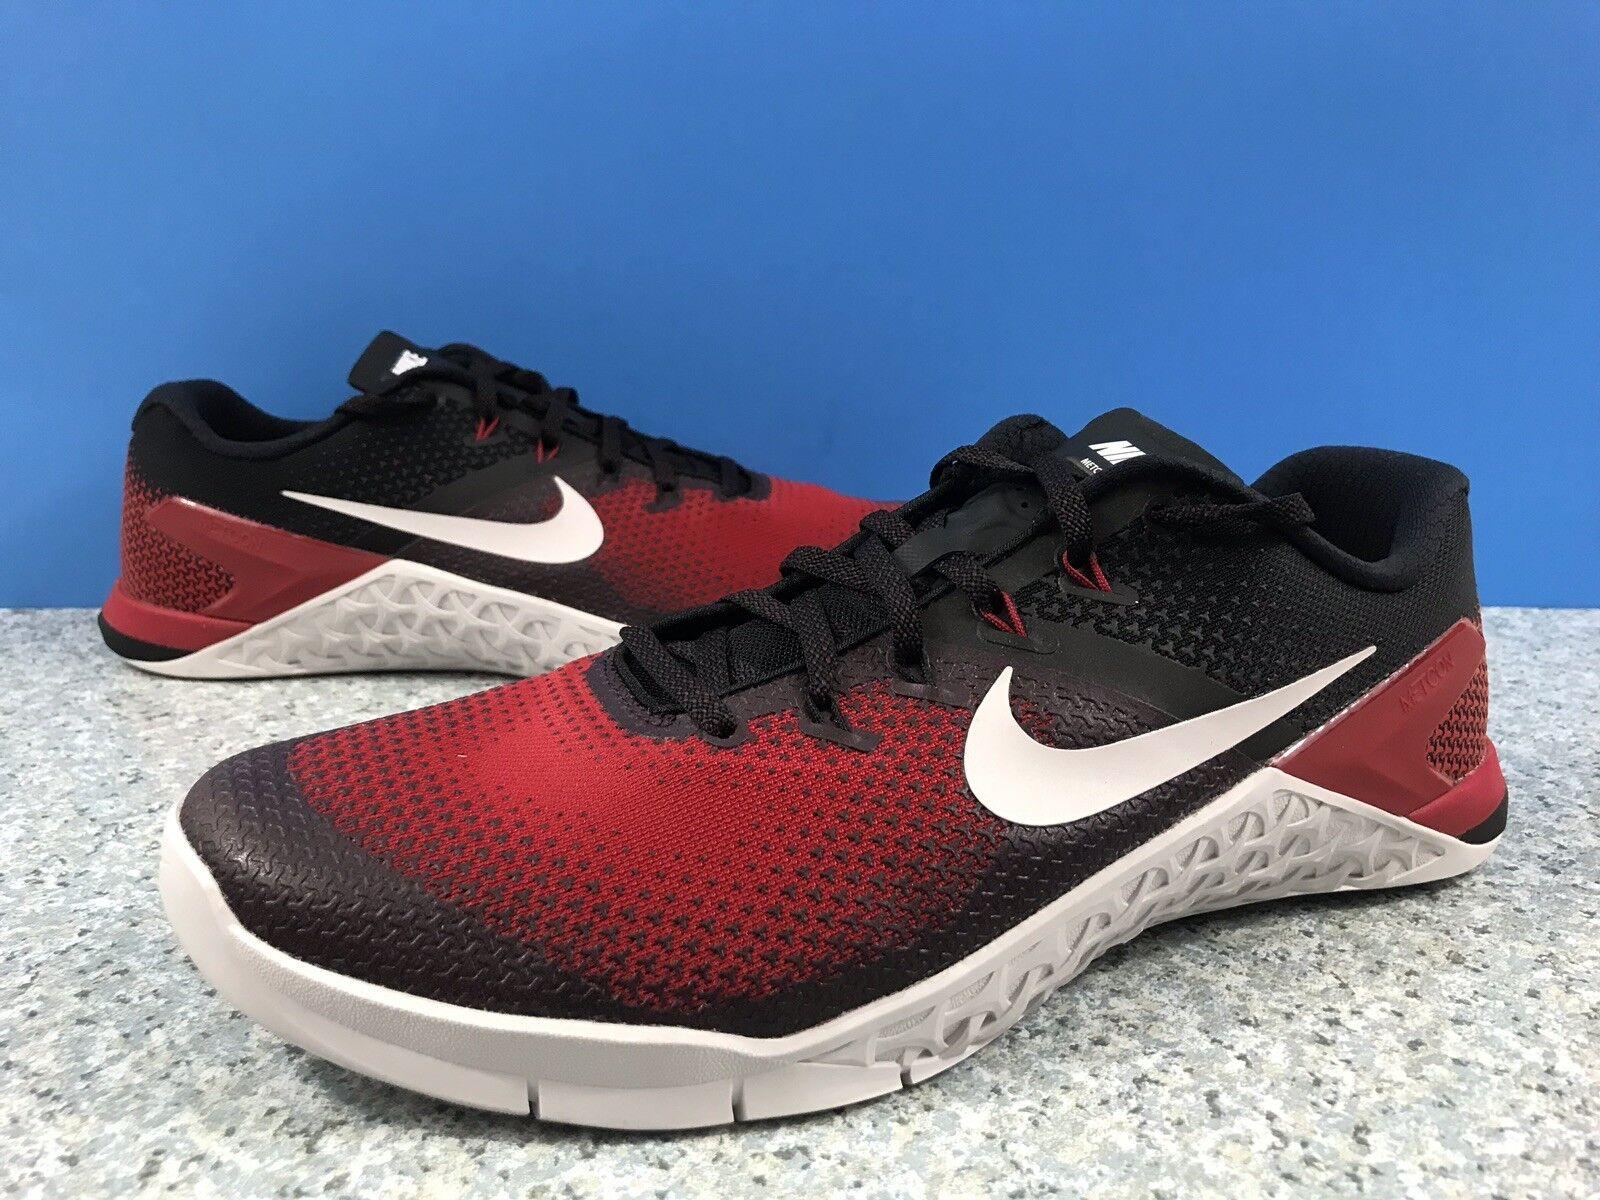 Nike Metcon 4 Training Shoe Hyper